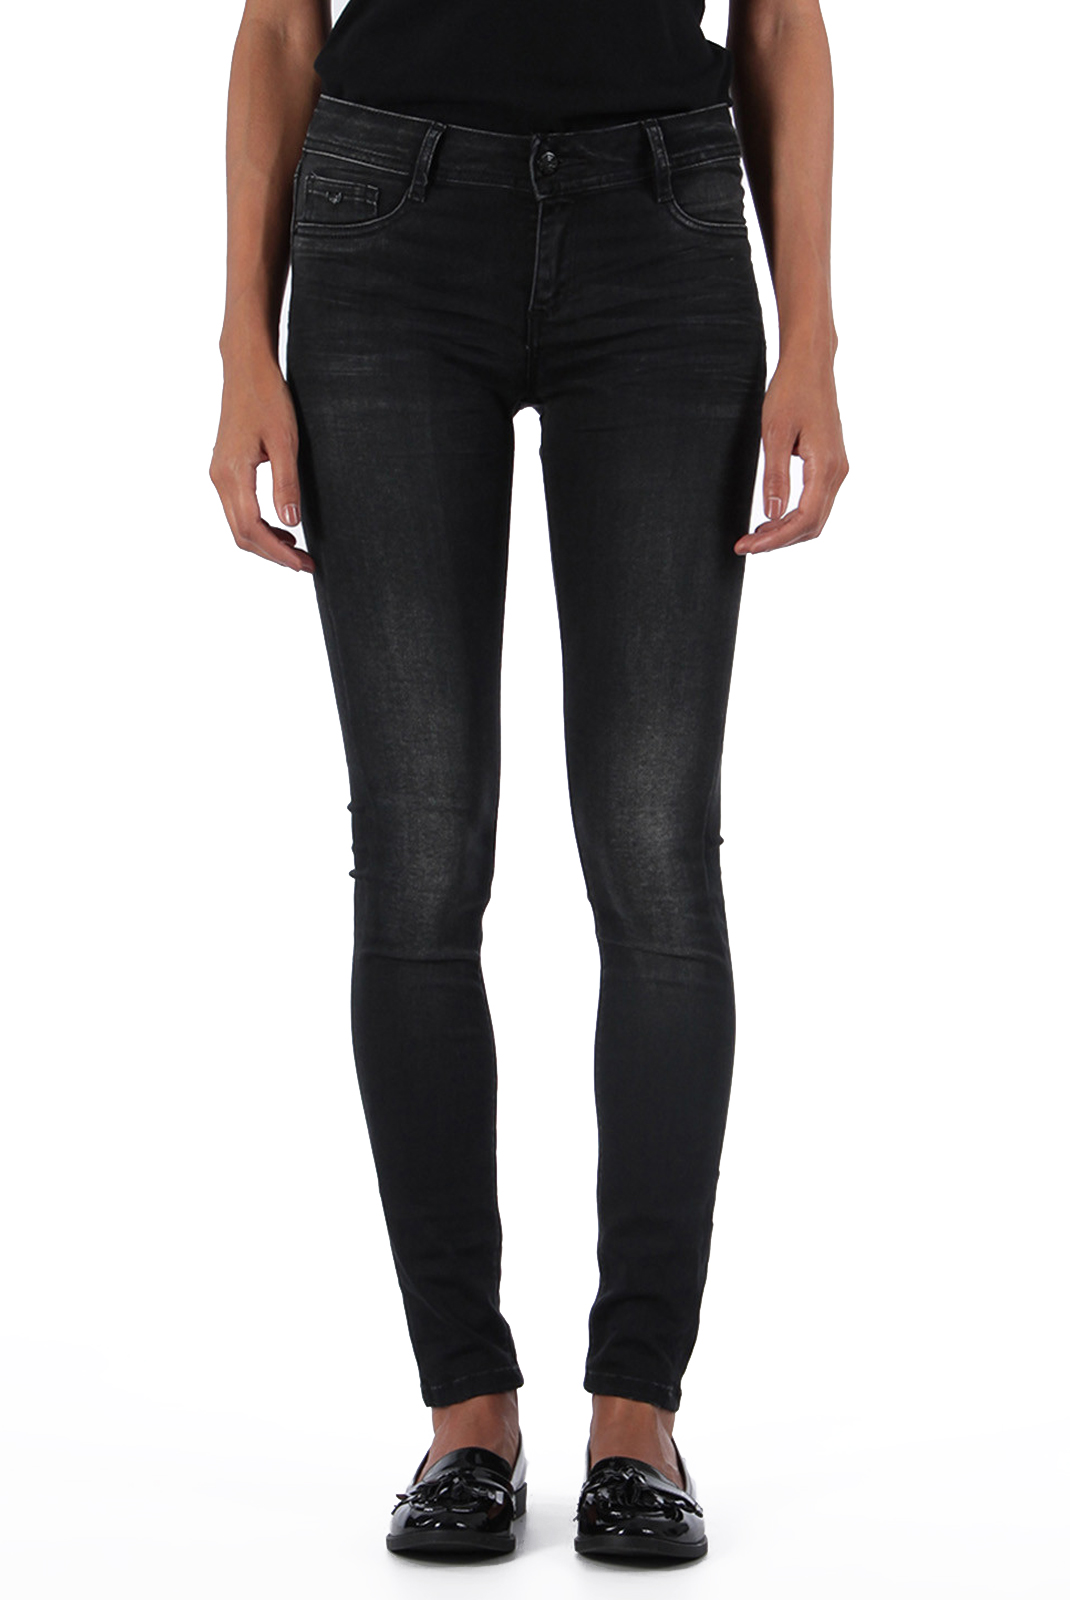 Jeans   Kaporal POWER H18W7 OLD BLACK